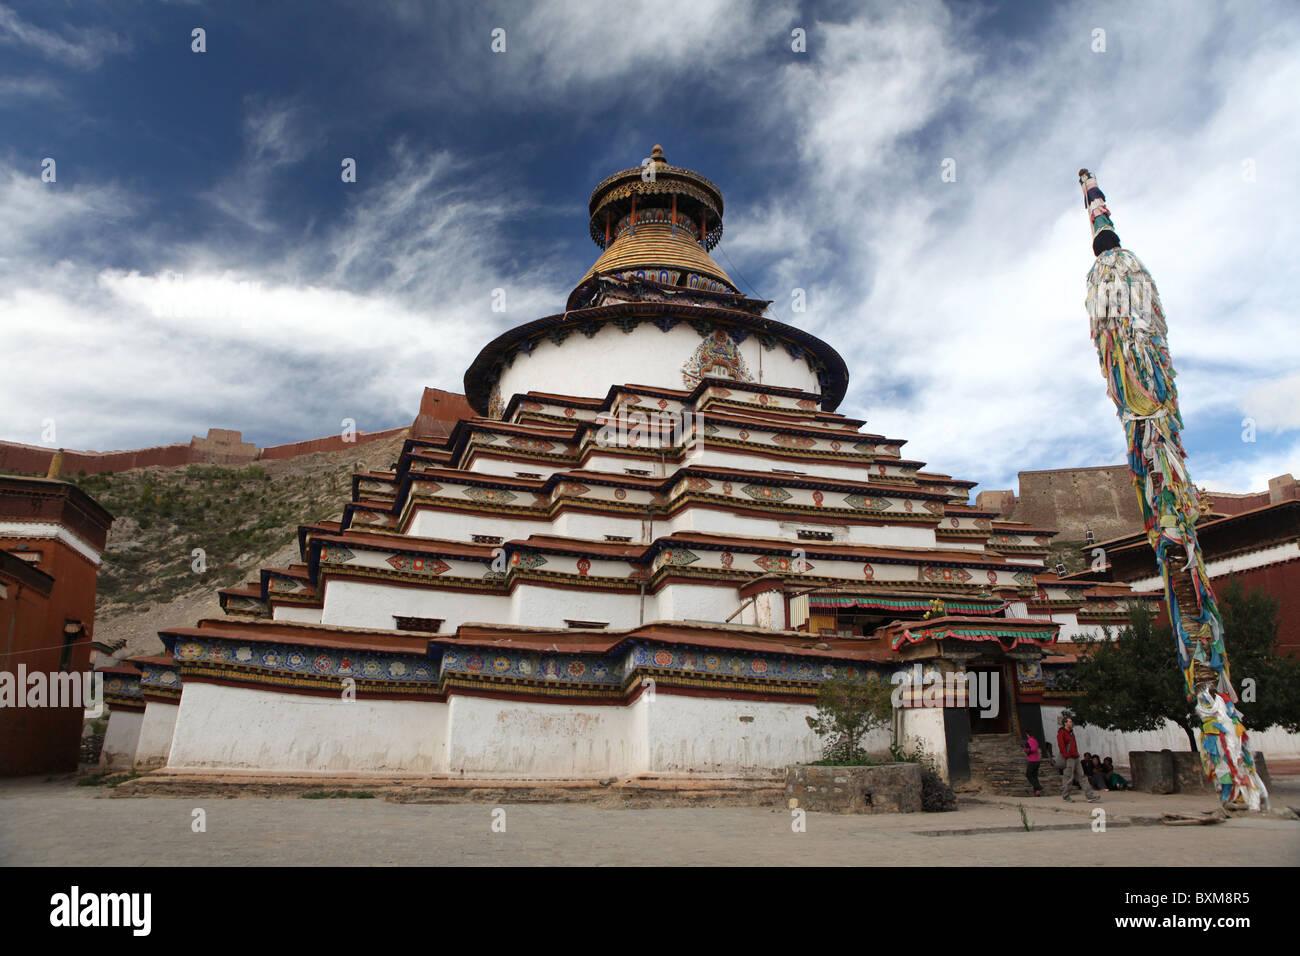 The Kumbum, part of the Palcho Monastry or Pelkor Choede in Gyantse or Gyangtse in Tibet, China. - Stock Image